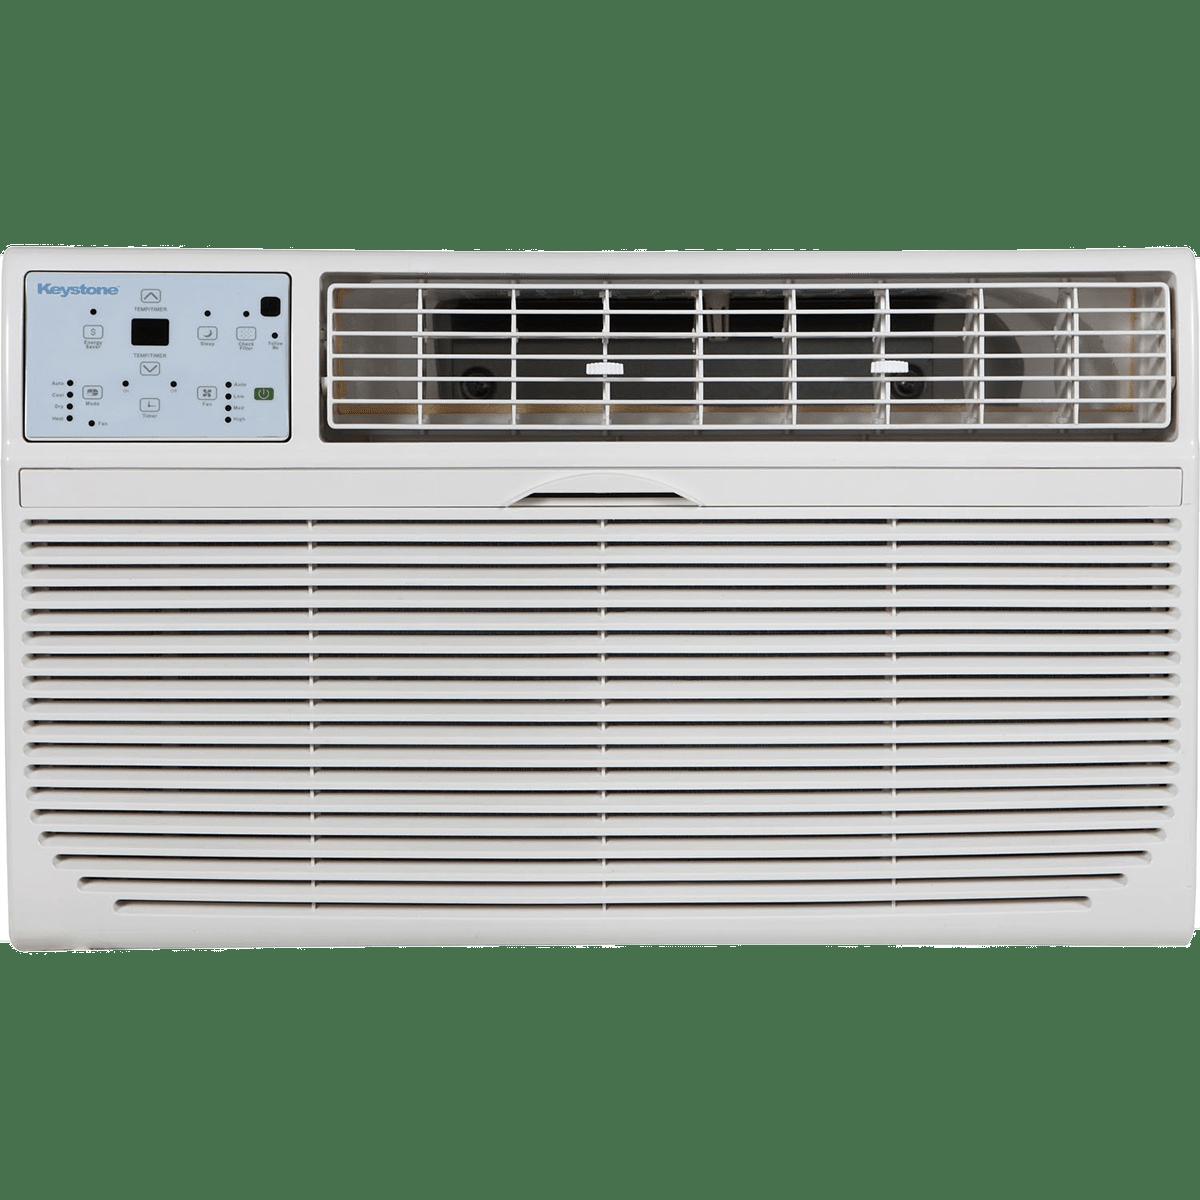 Charmant Keystone 14K TTW Air Conditioner 230 V KSTAT14 2C